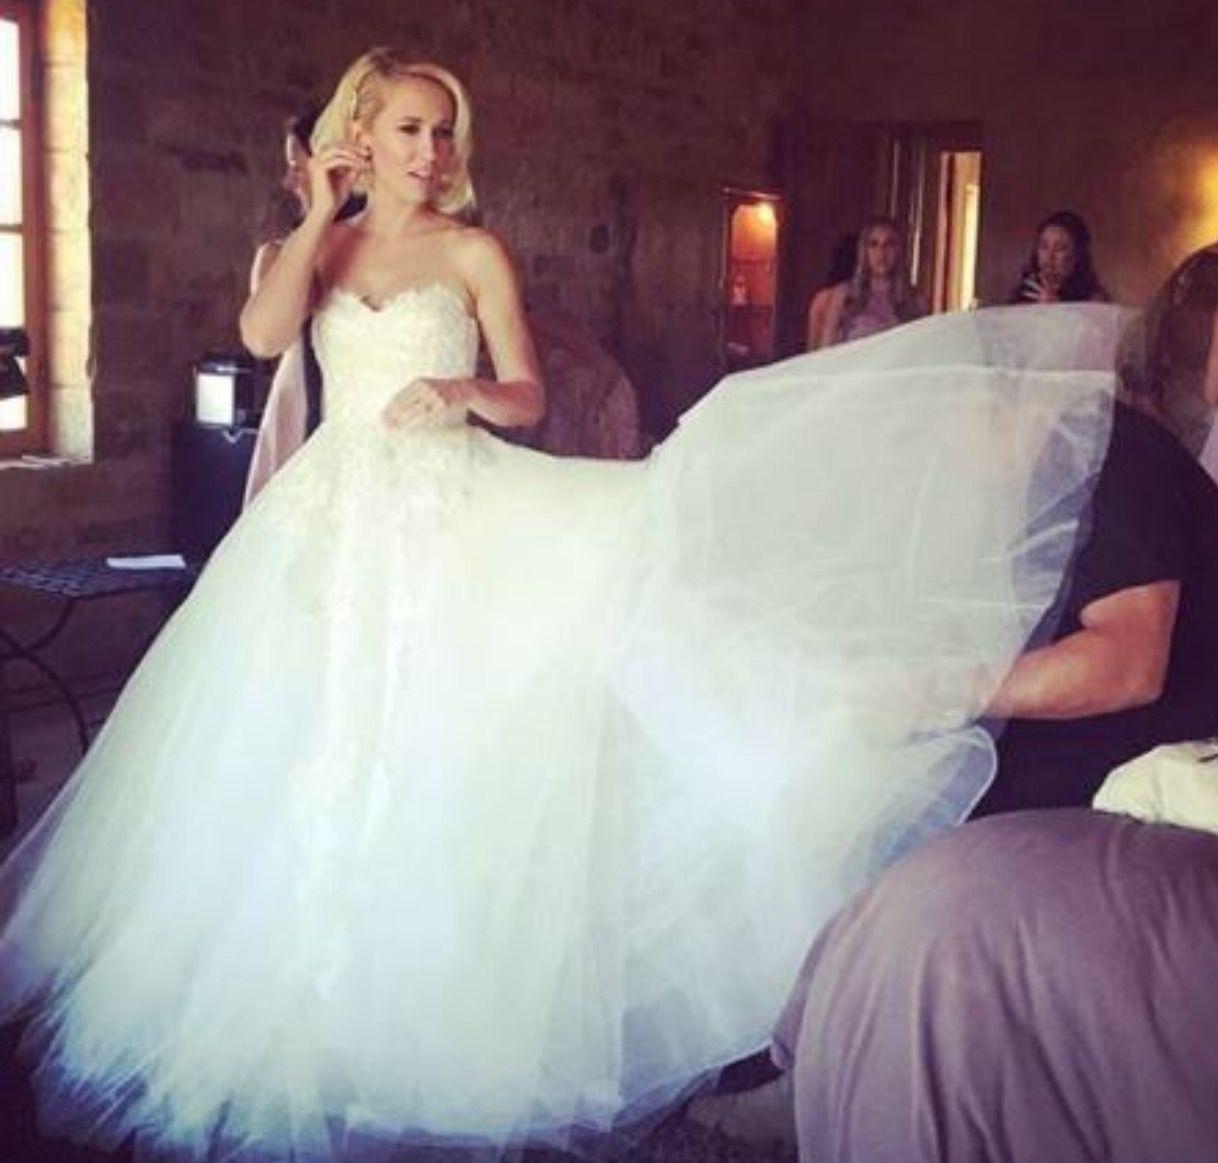 Big pretty wedding dresses  Pin by Katelyn Douglas on The BIG day  Pinterest  Big